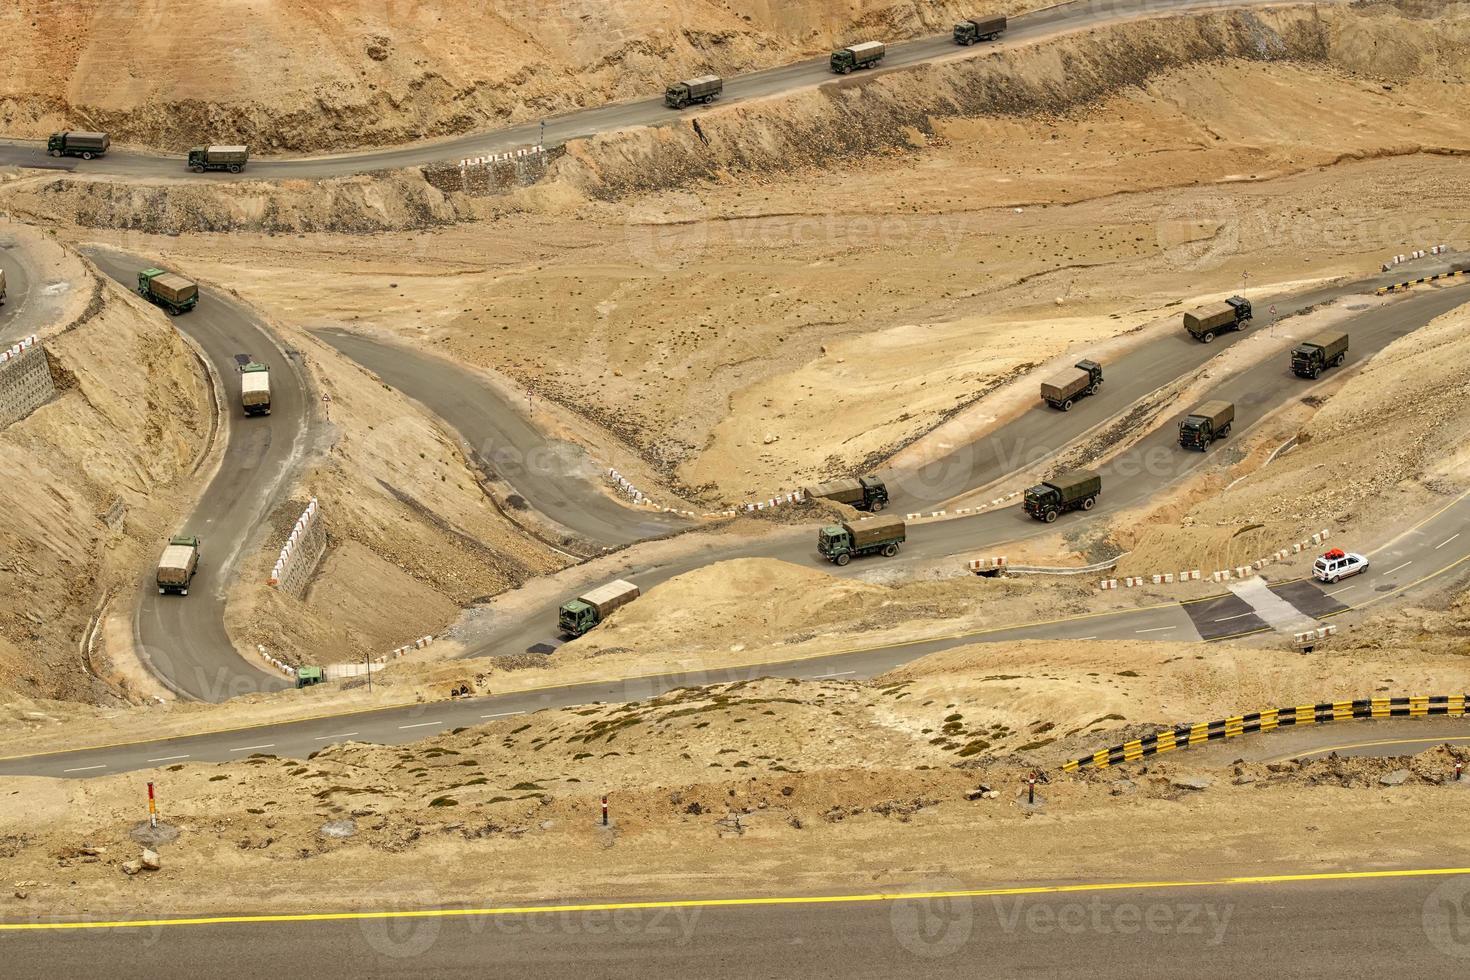 Zigzag road, Leh Srinagar Highway, Ladakh, Jammu and Kashmir, India photo